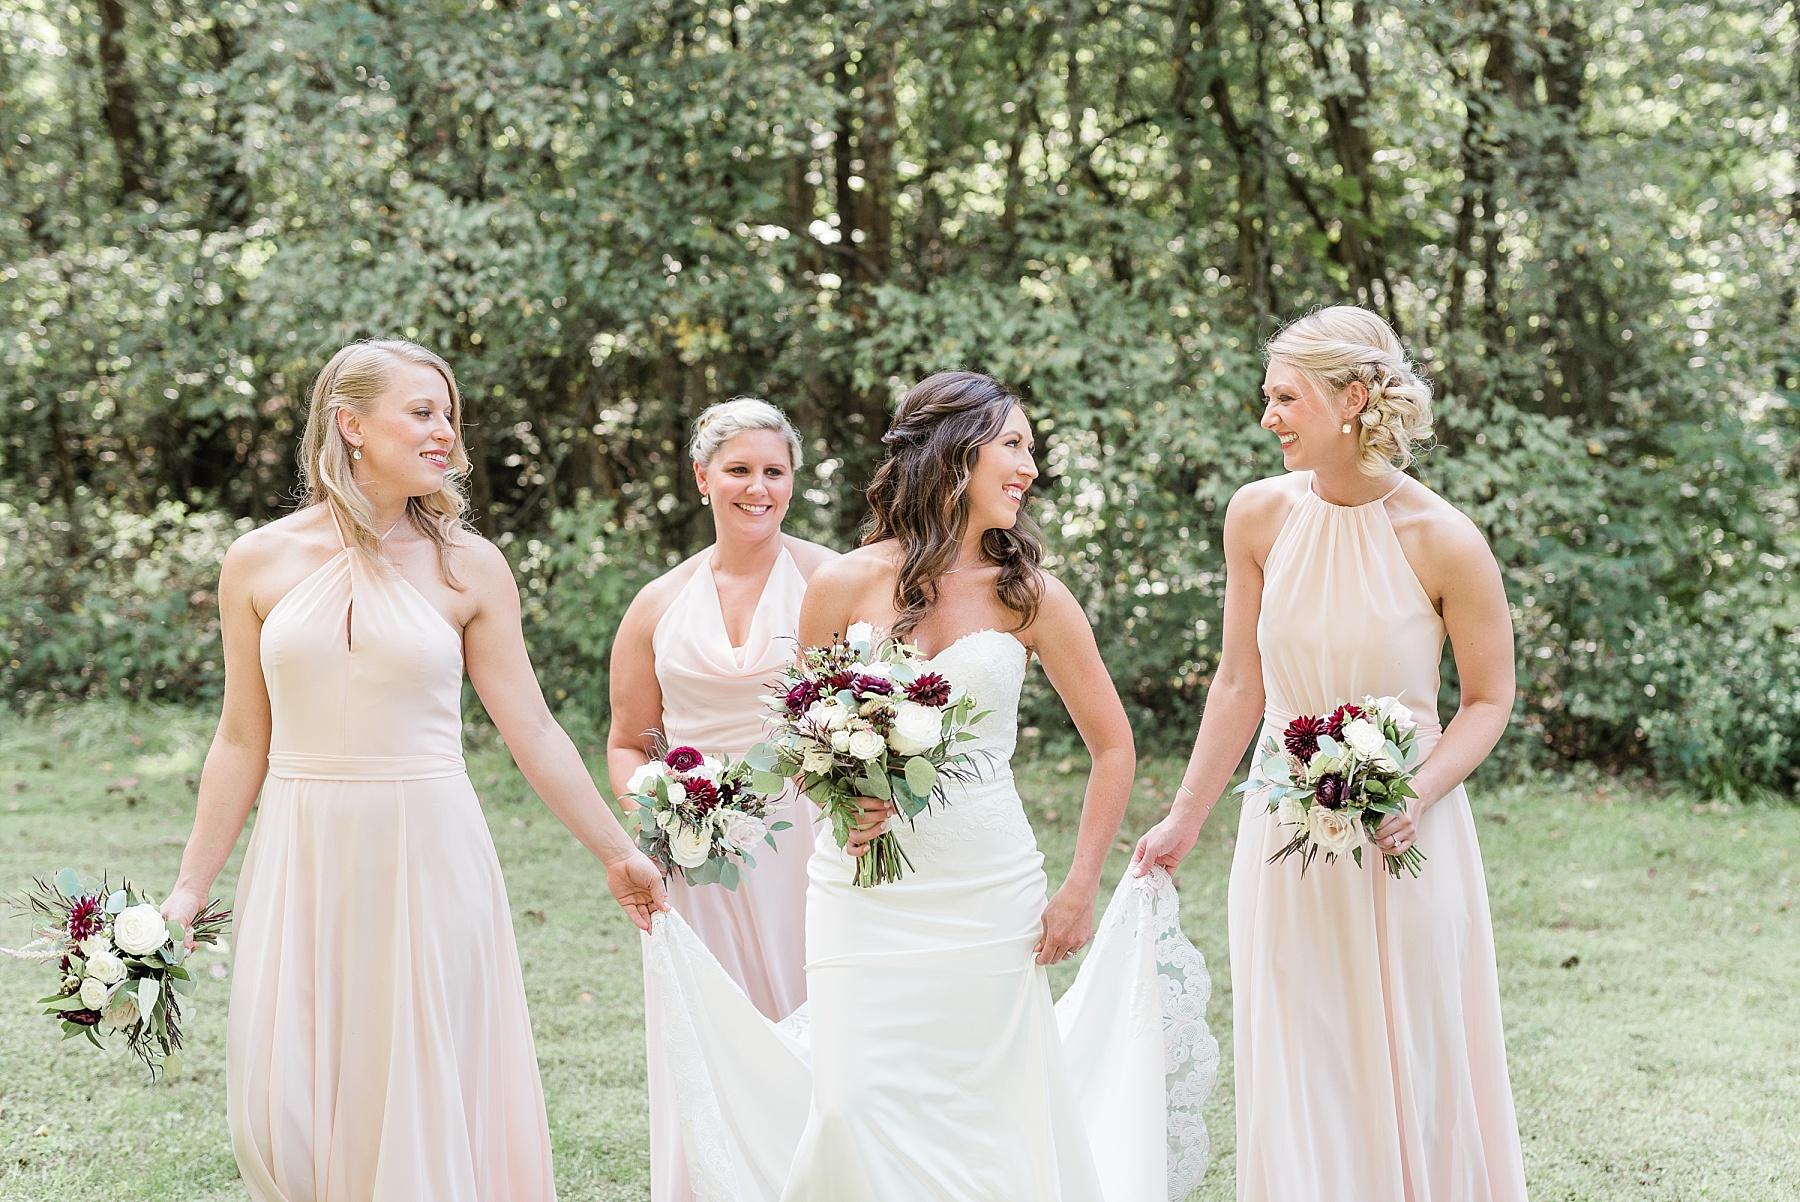 Romantic Summer Sunset Wedding Ceremony at Little Piney Lodge St. Louis Missouri by Kelsi Kliethermes Photography Fine Art Photographer_0004.jpg